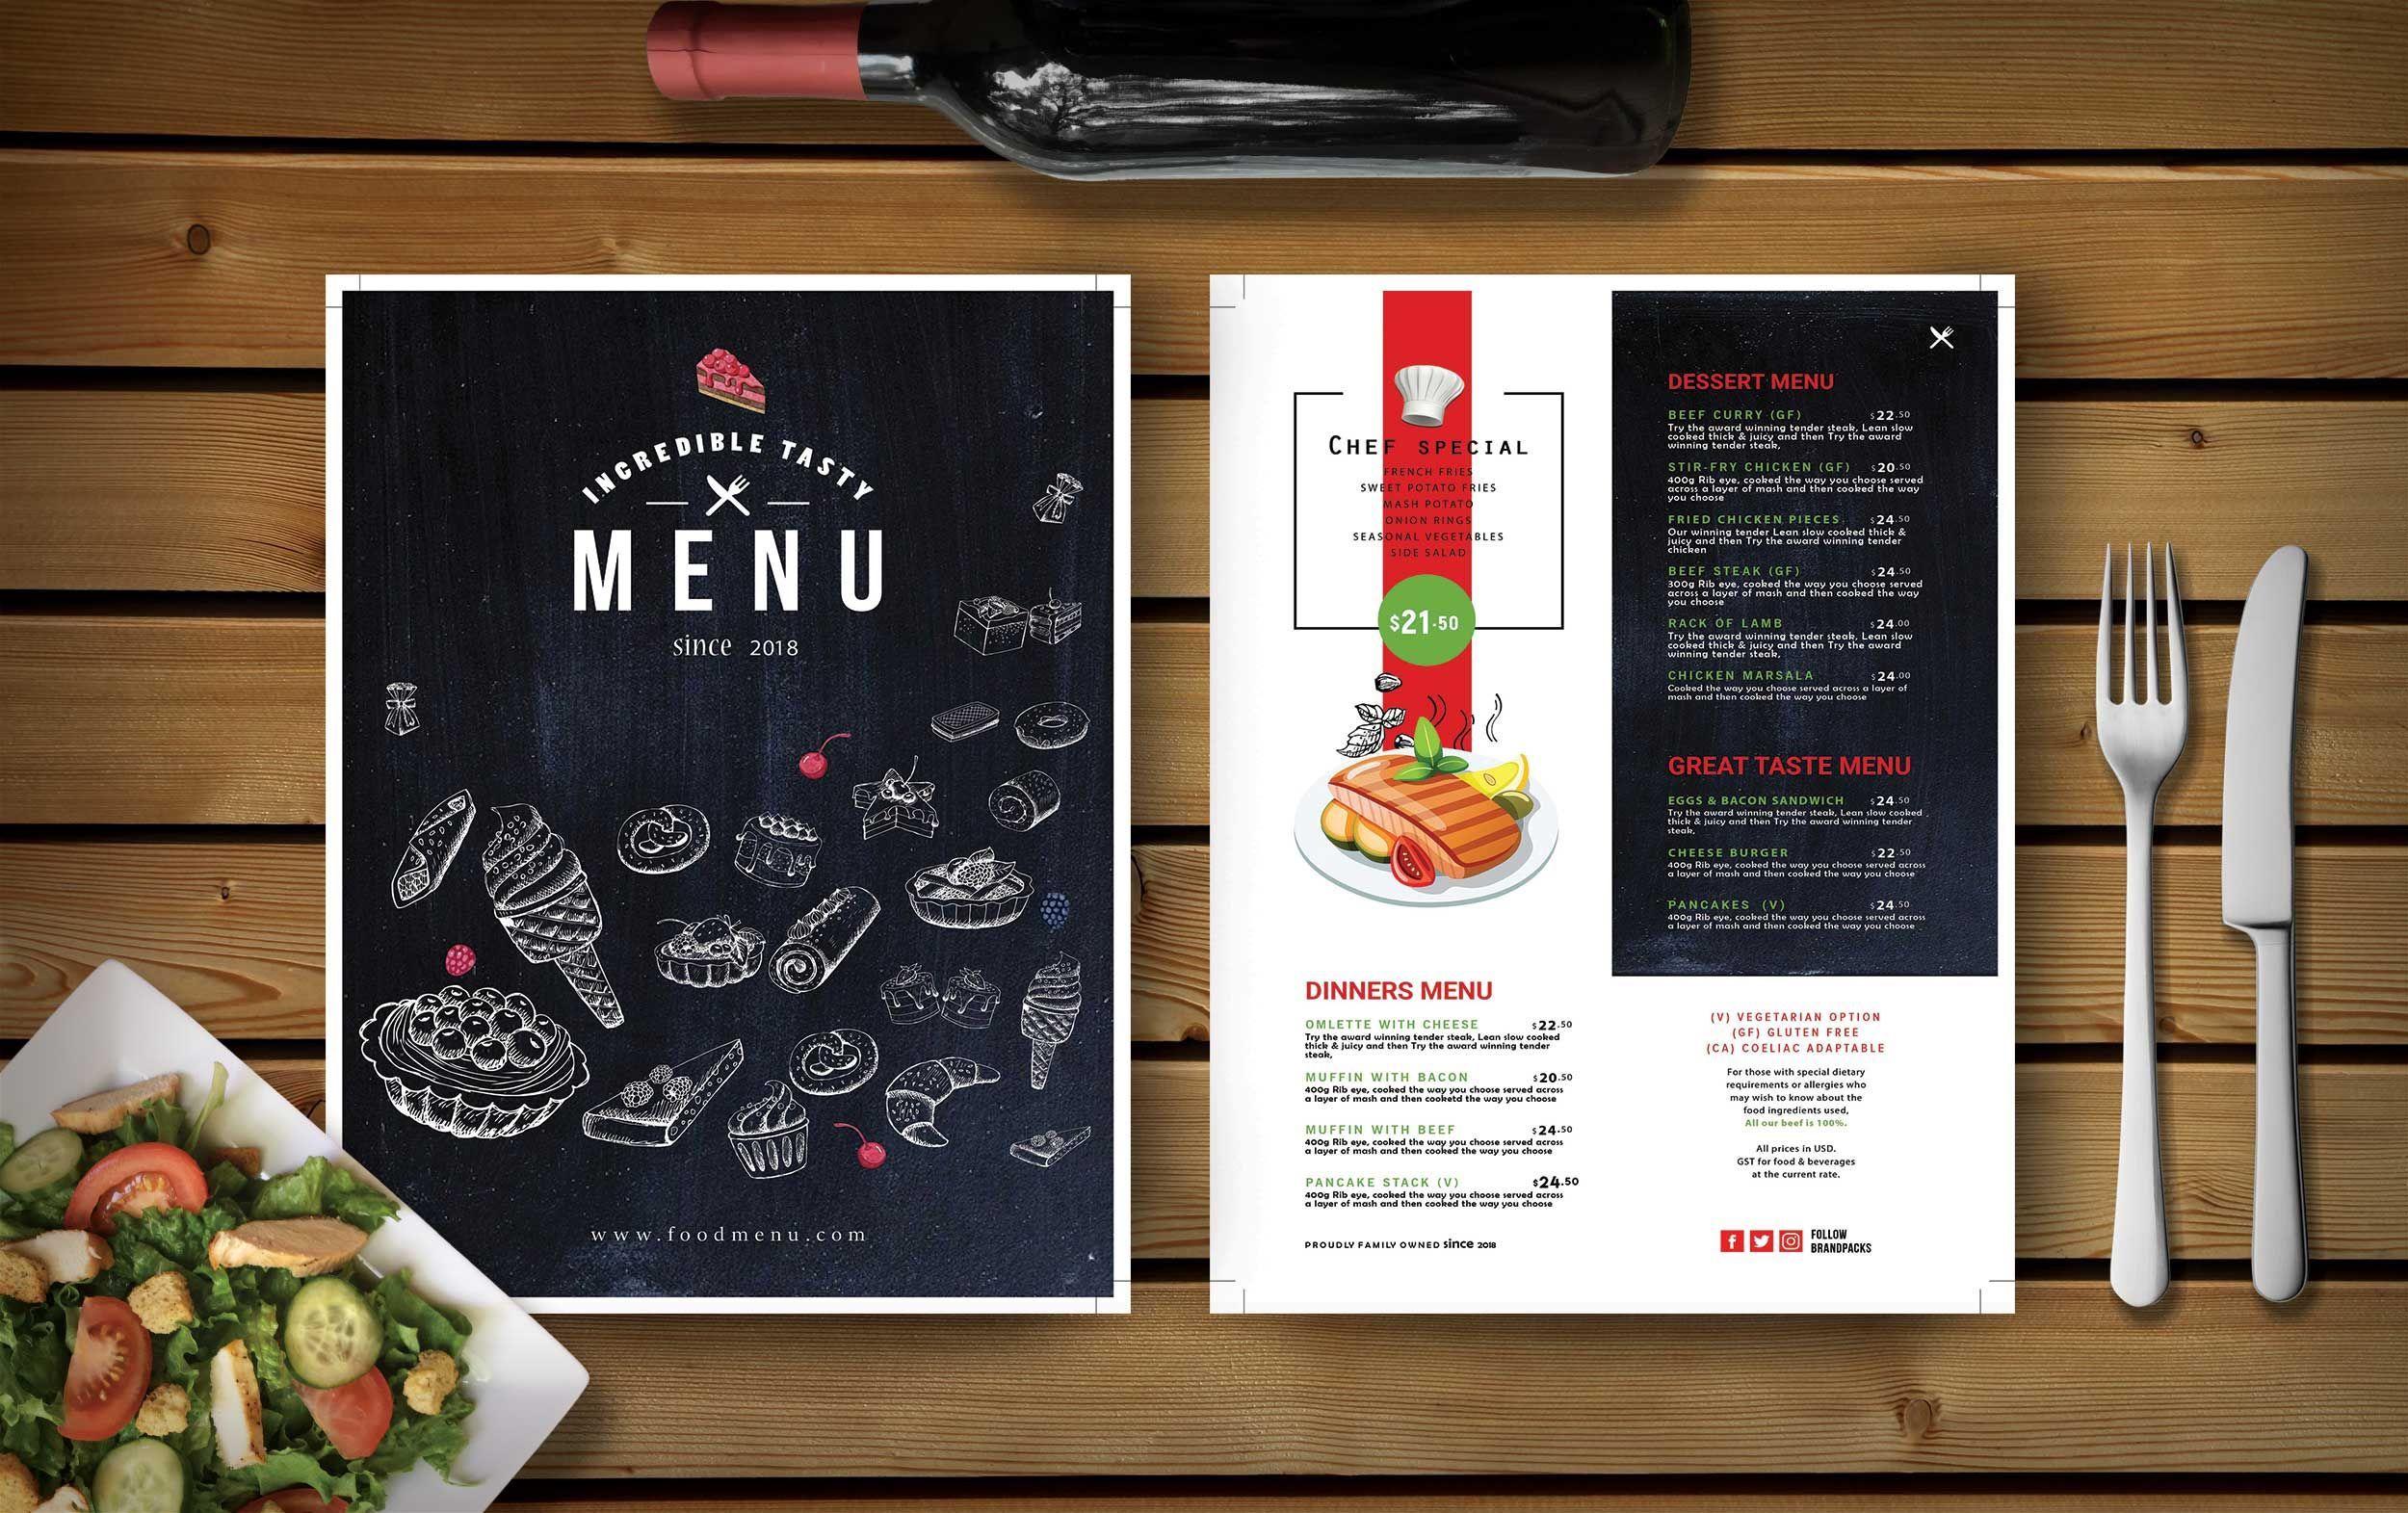 000 Impressive Restaurant Menu Template Free Download Psd Photo  DesignFull